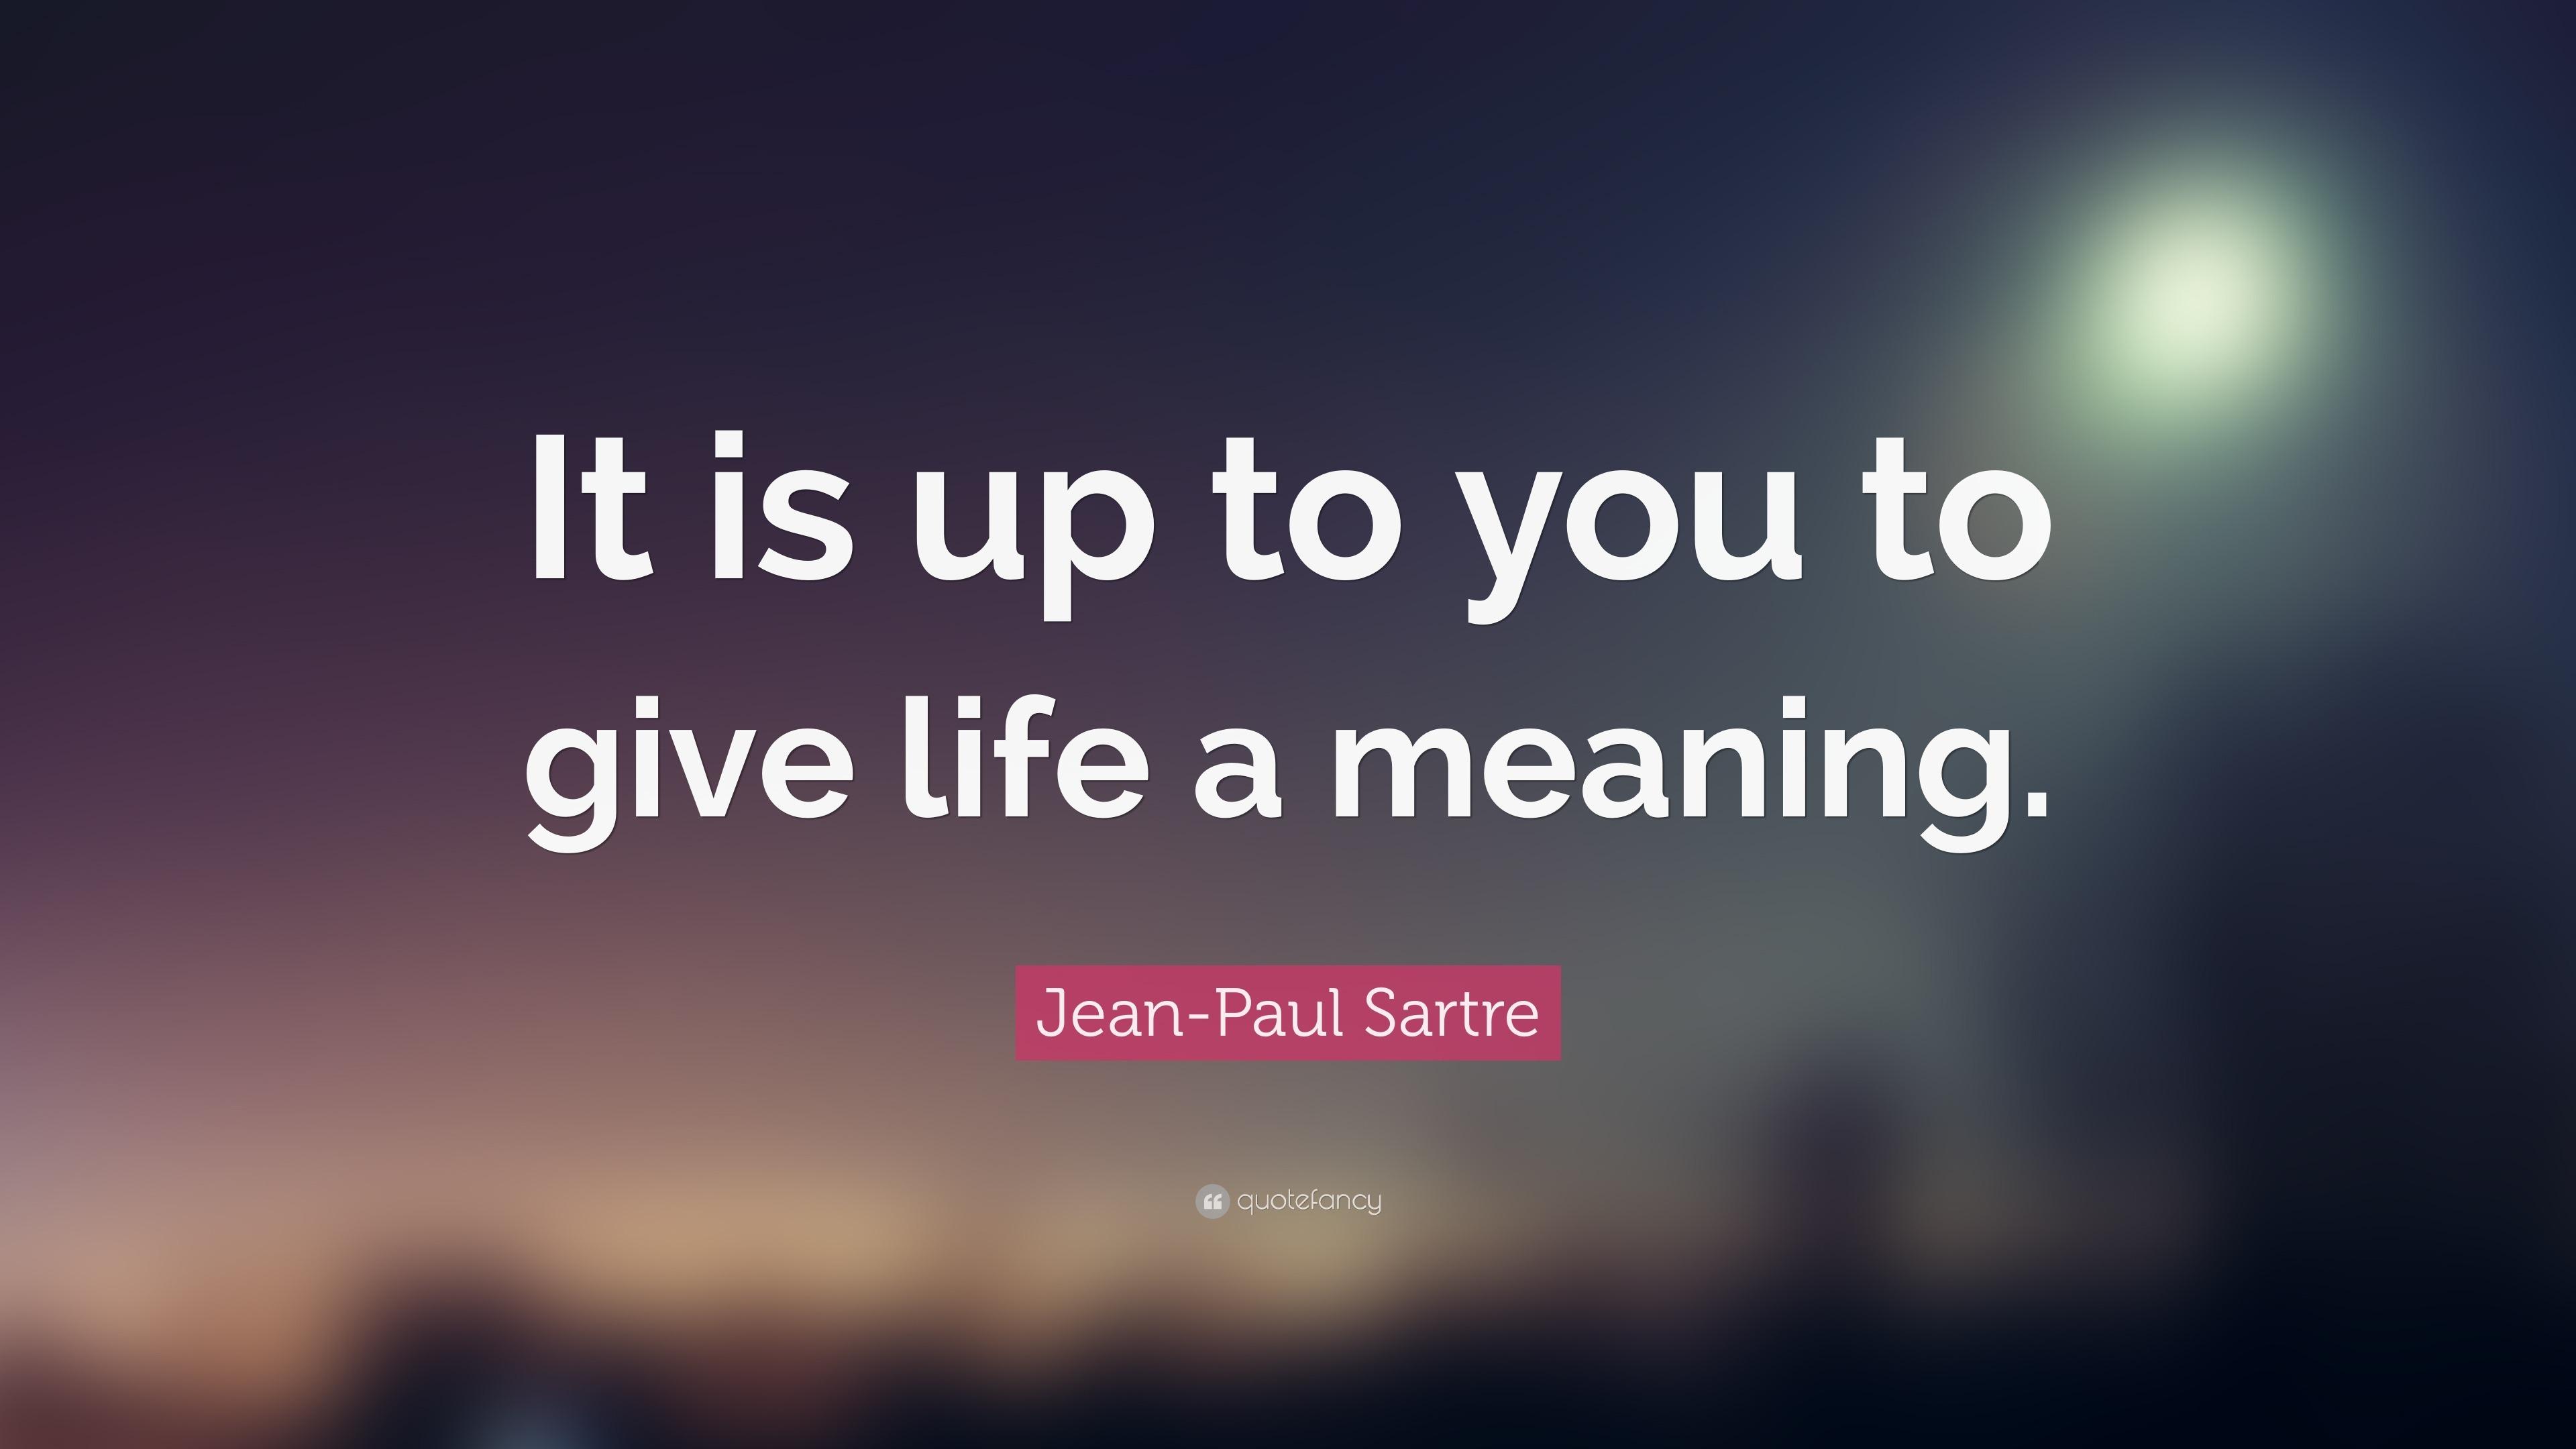 Jean-Paul Sartre Quotes (309 wallpapers) - Quotefancy